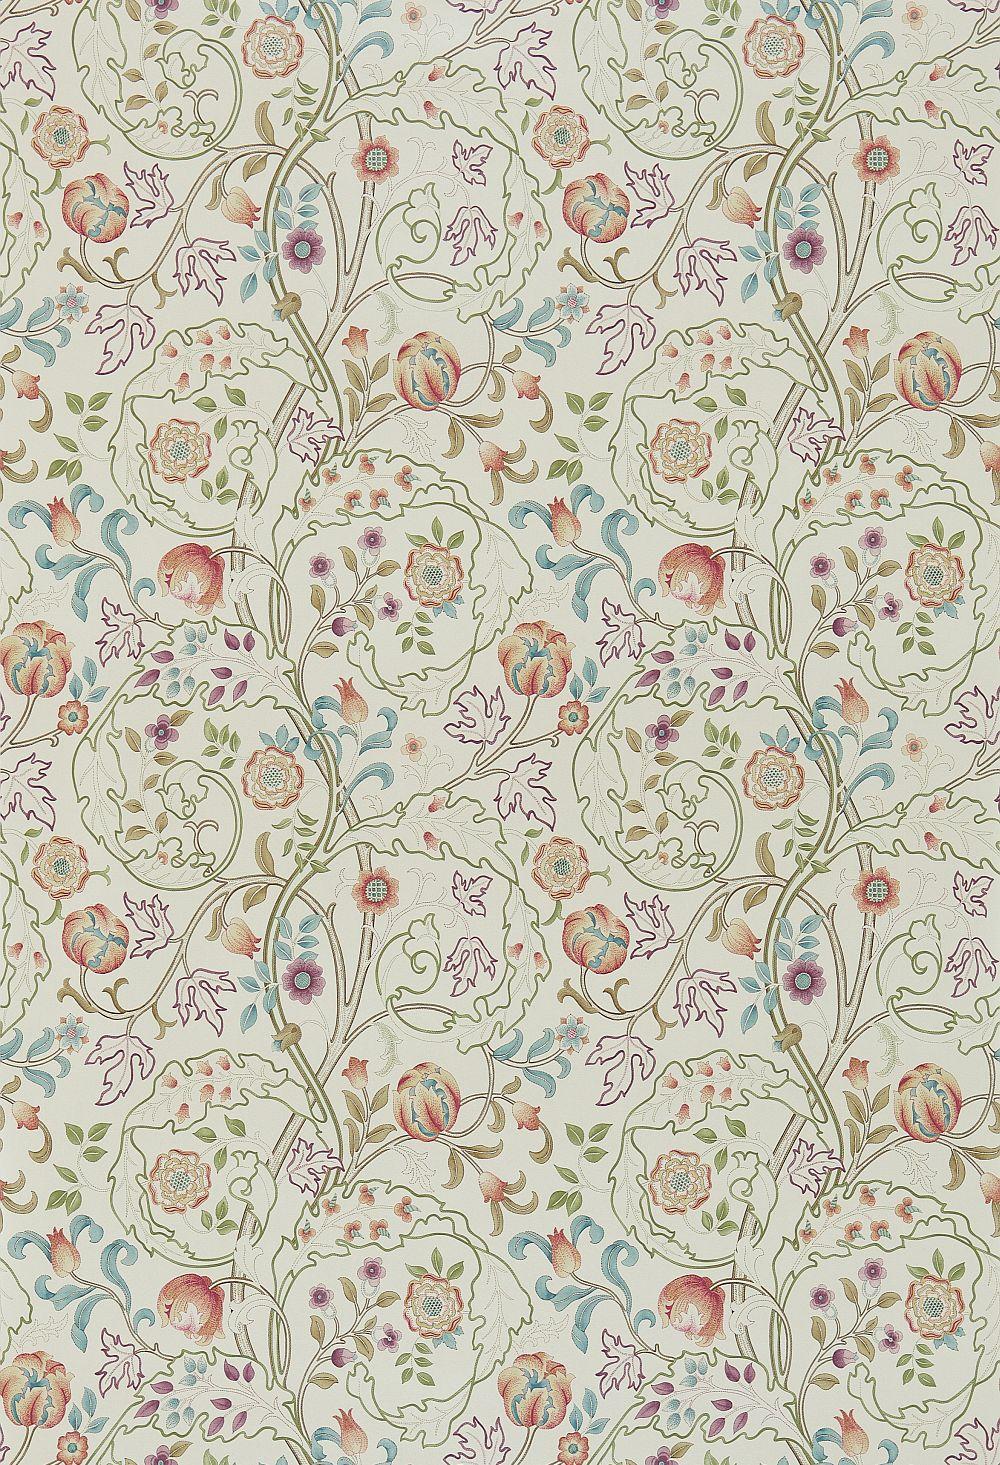 Morris Mary Isobel Rose / Artichoke Wallpaper - Product code: 214729